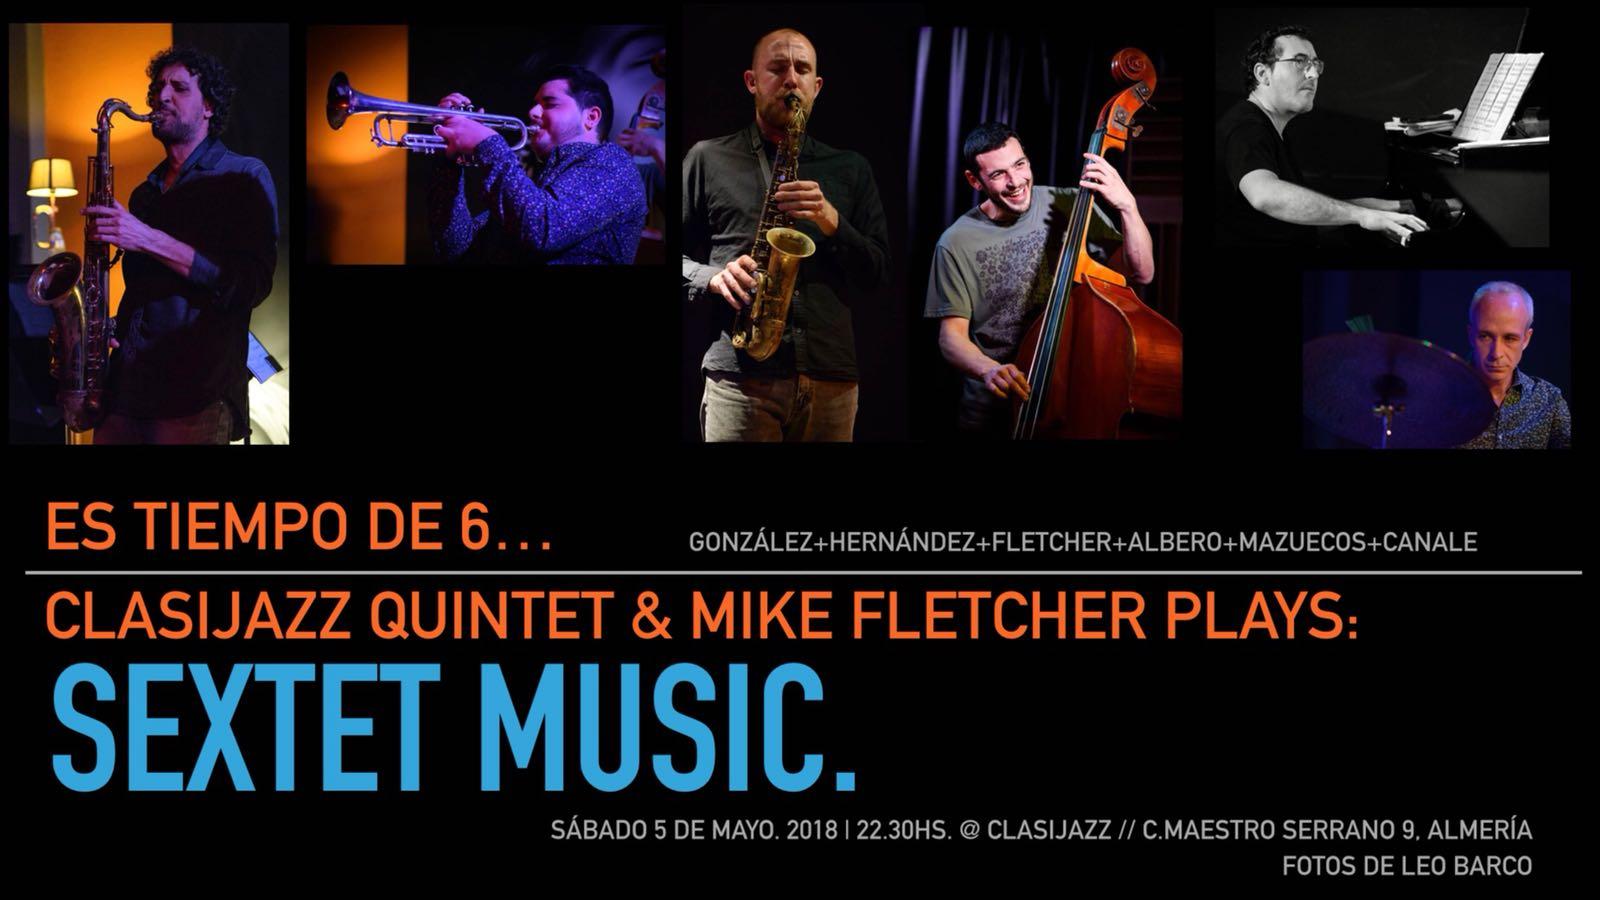 Clasijazz Quintet & Mike Fletcher plays hard bop music